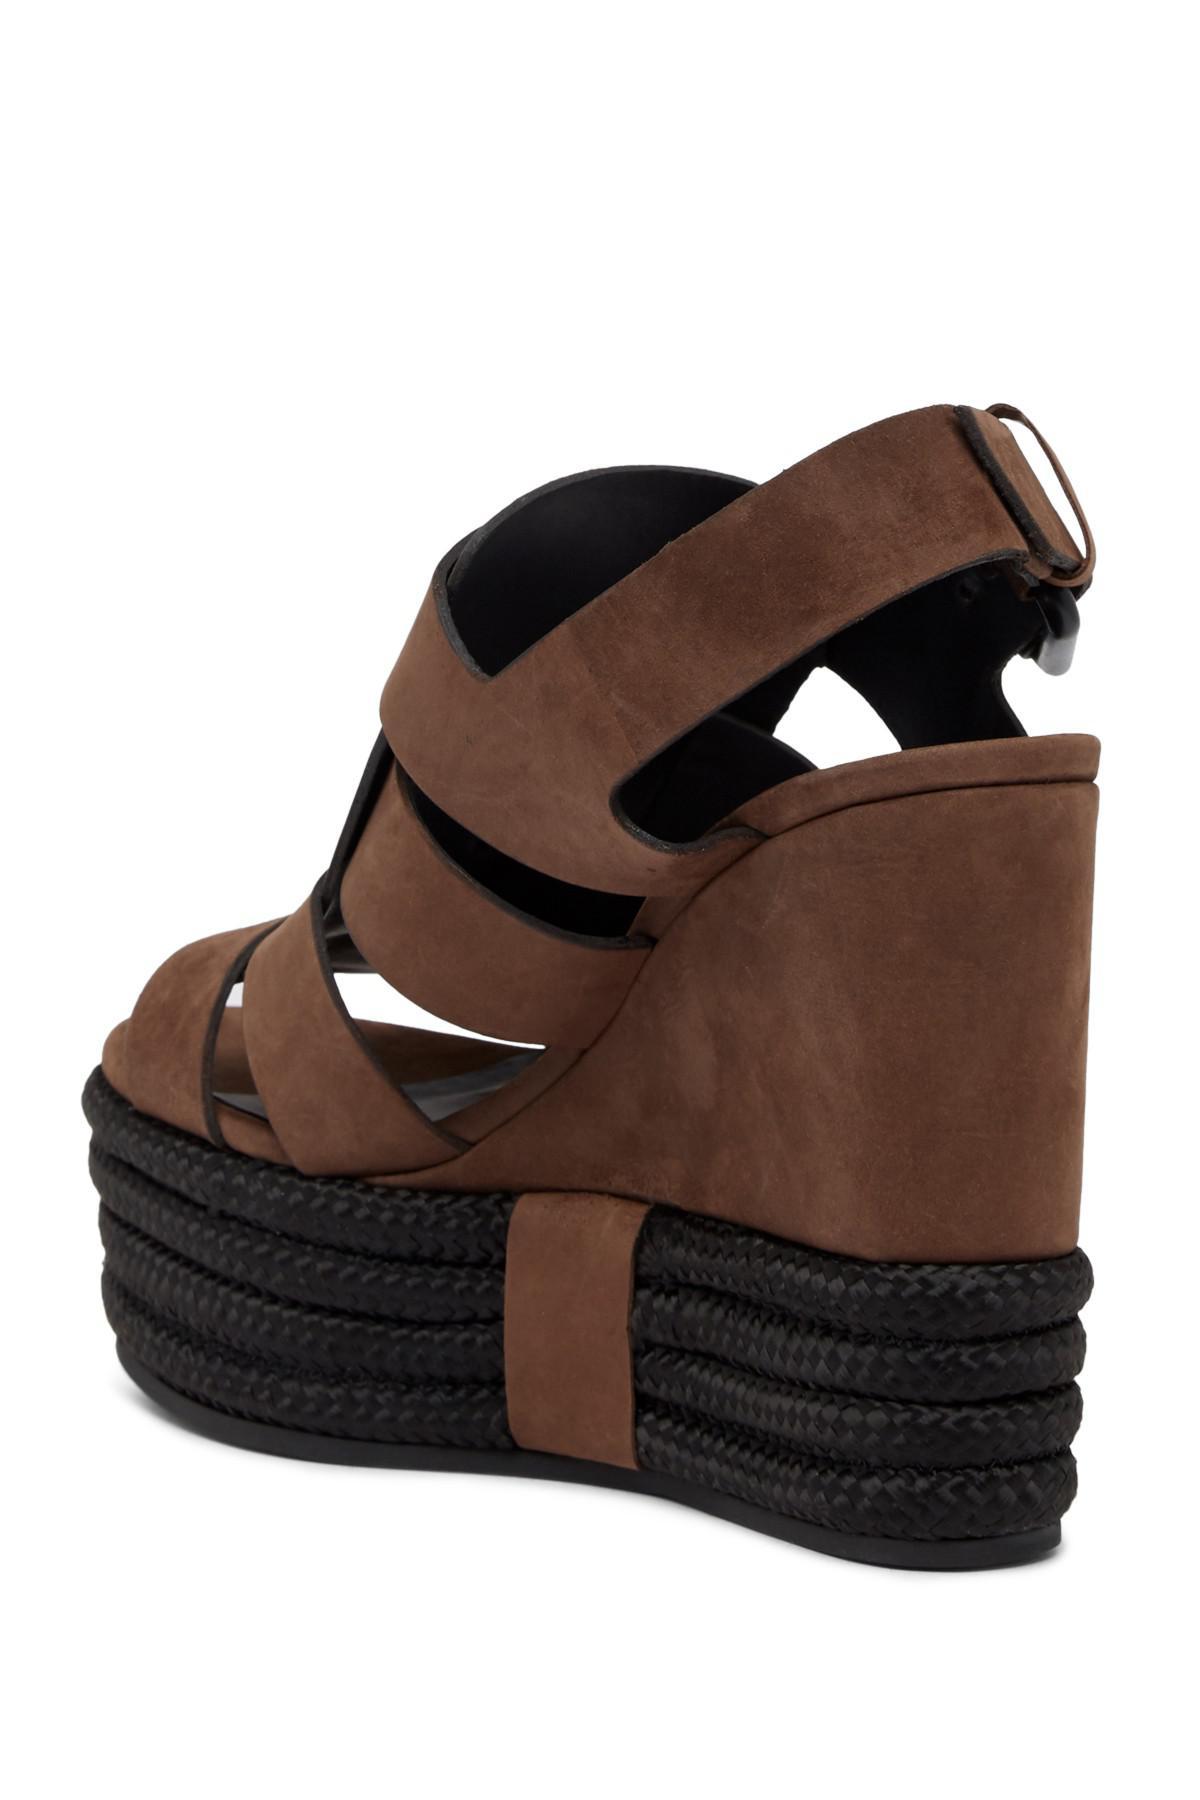 893be68644e Lyst - AllSaints Marzee Platform Wedge Sandal in Brown